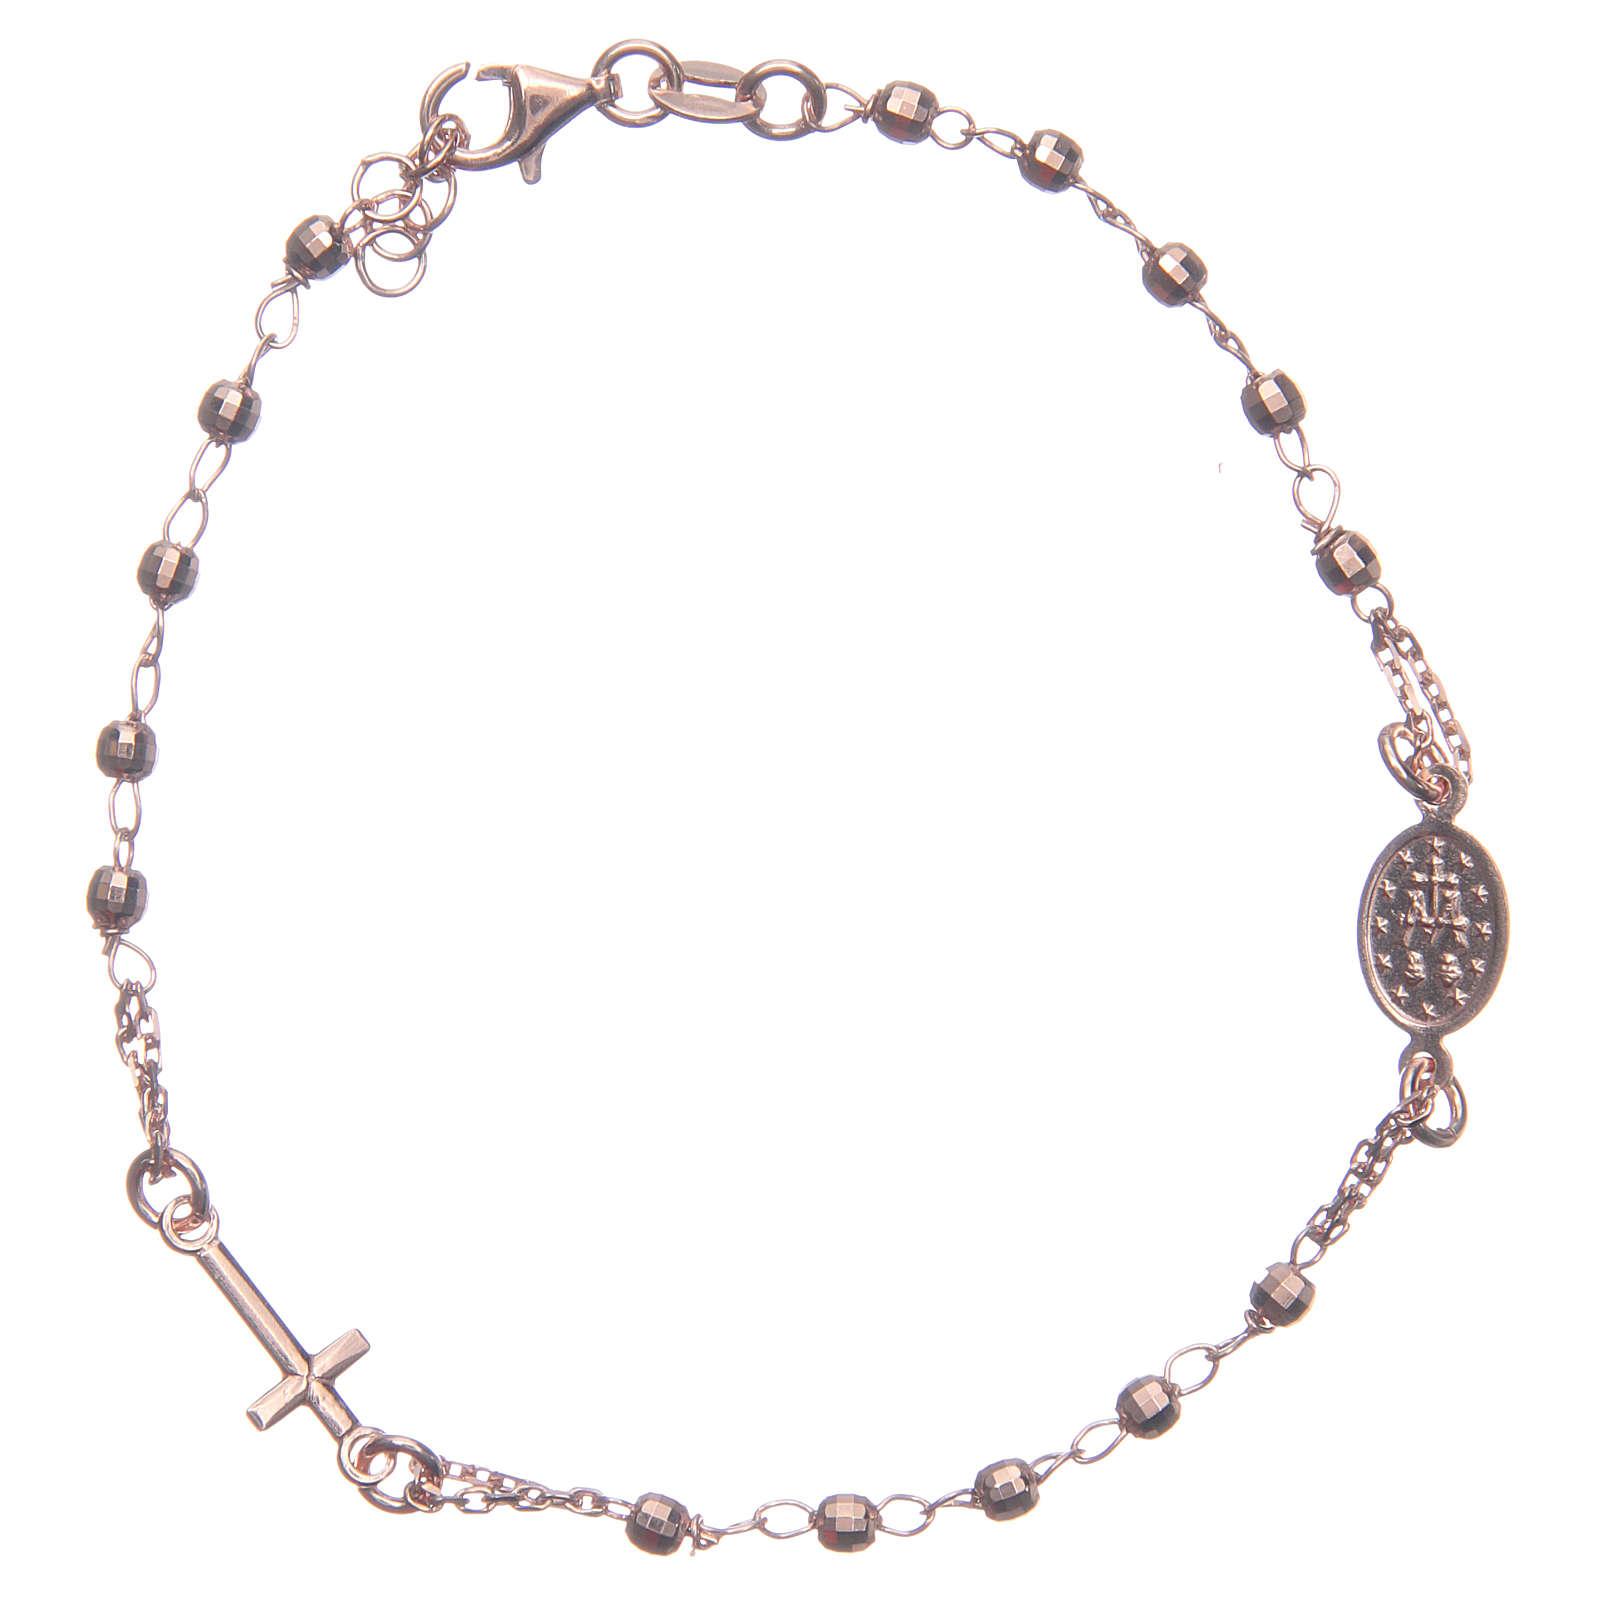 Bracciale rosario colore rosé argento 925 4